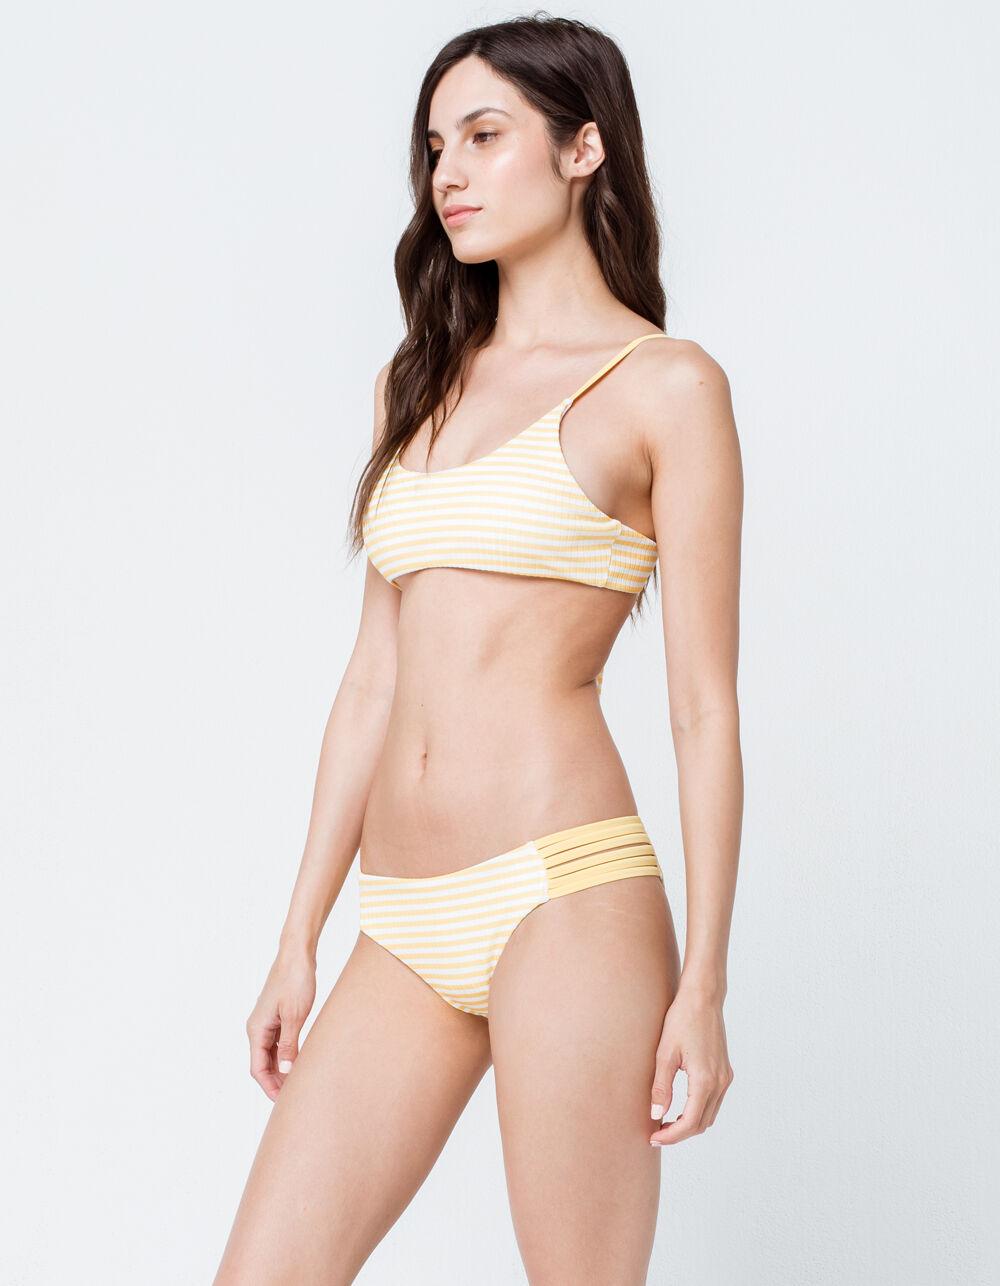 BYRDS OF PARADISE Evalina Hipster Bikini Bottoms